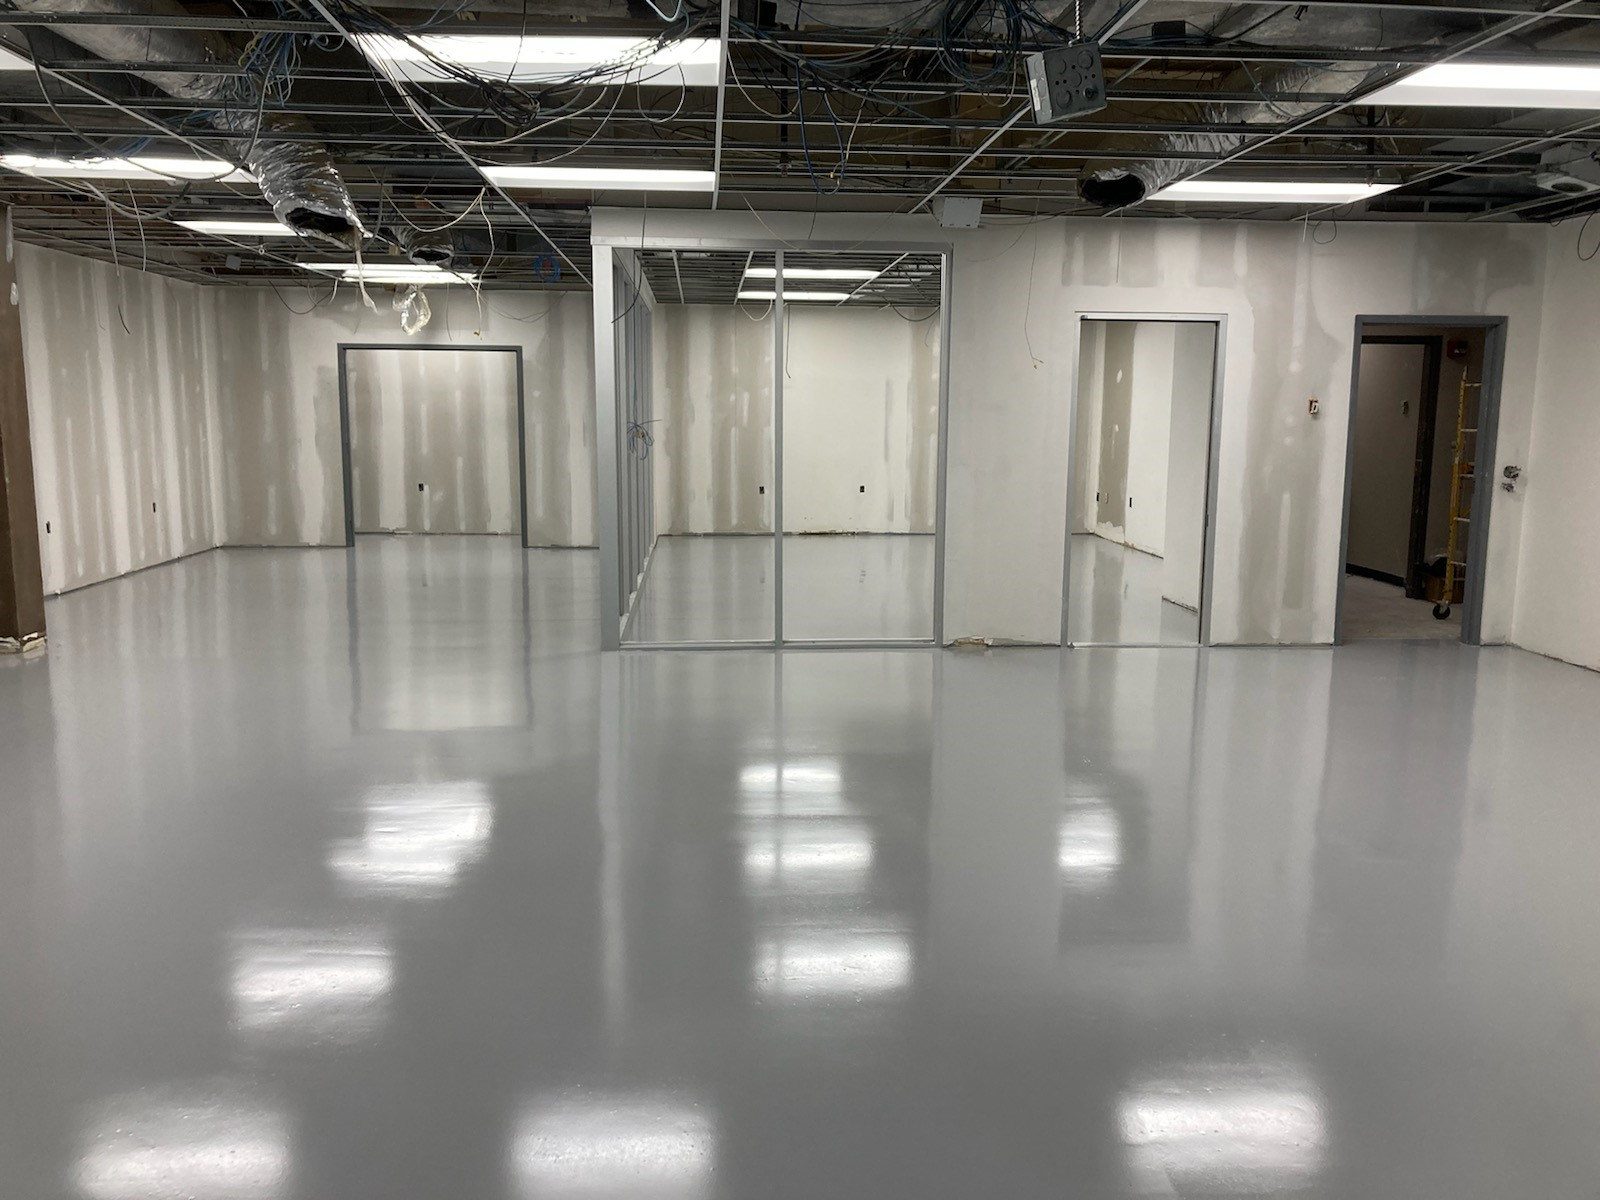 concrete floor resurfacing, flooring contractors Collierville TN, TeamIA, Industrial Applications Inc., epoxy floor coatings, manufacturing flooring, Collierville TN